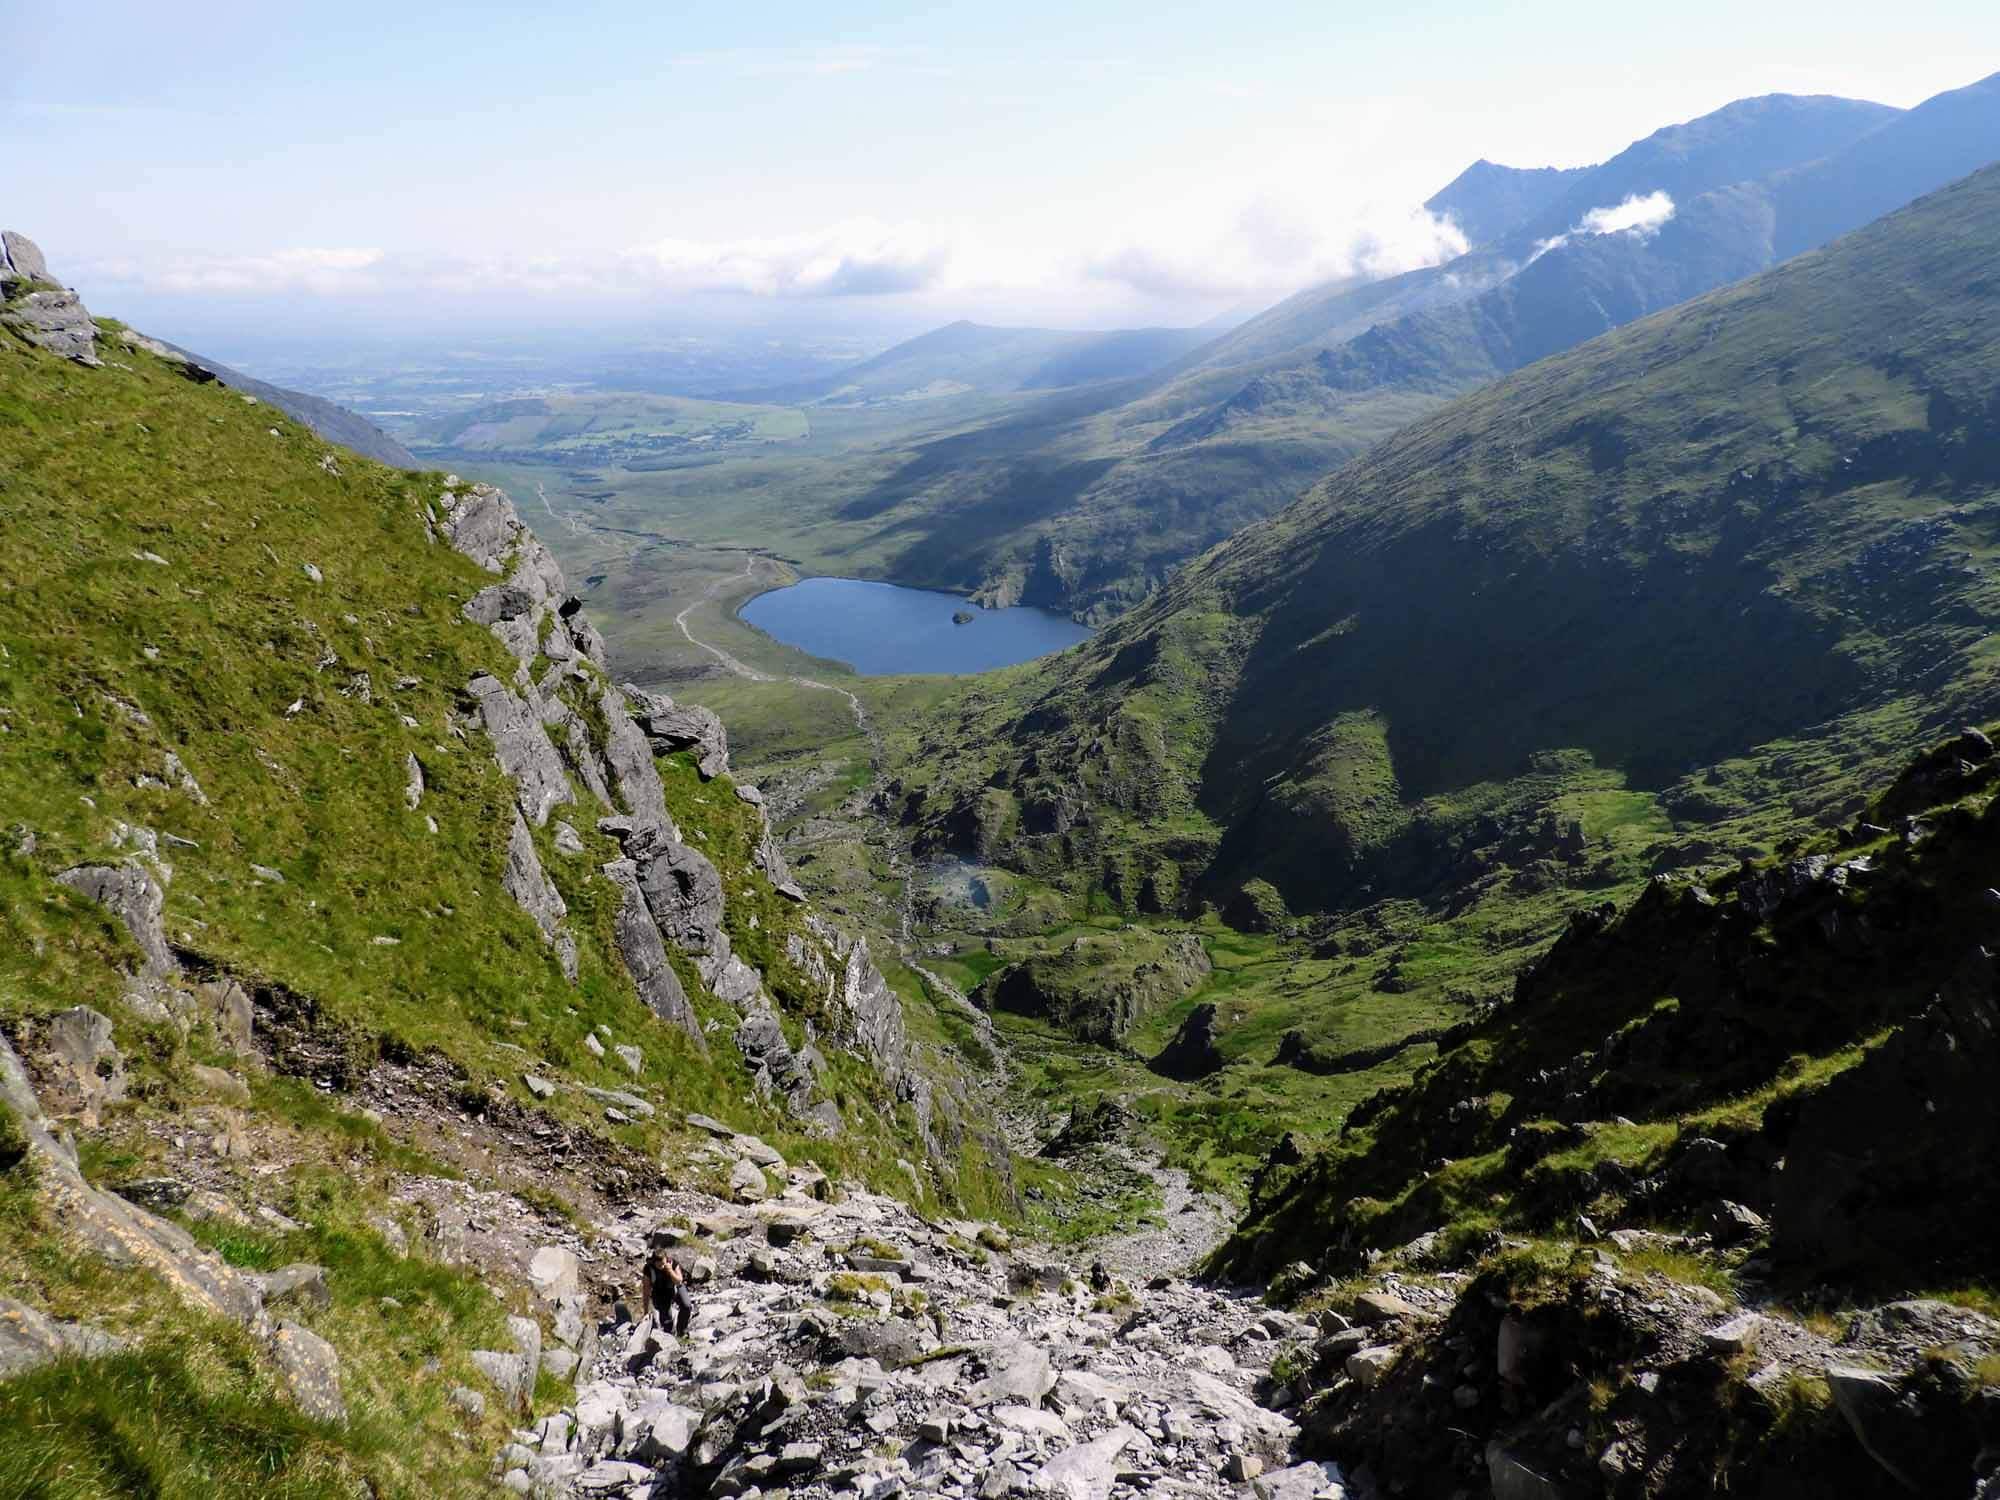 ireland-carrauntoohil-highest-mountain-peak-view-top.jpg